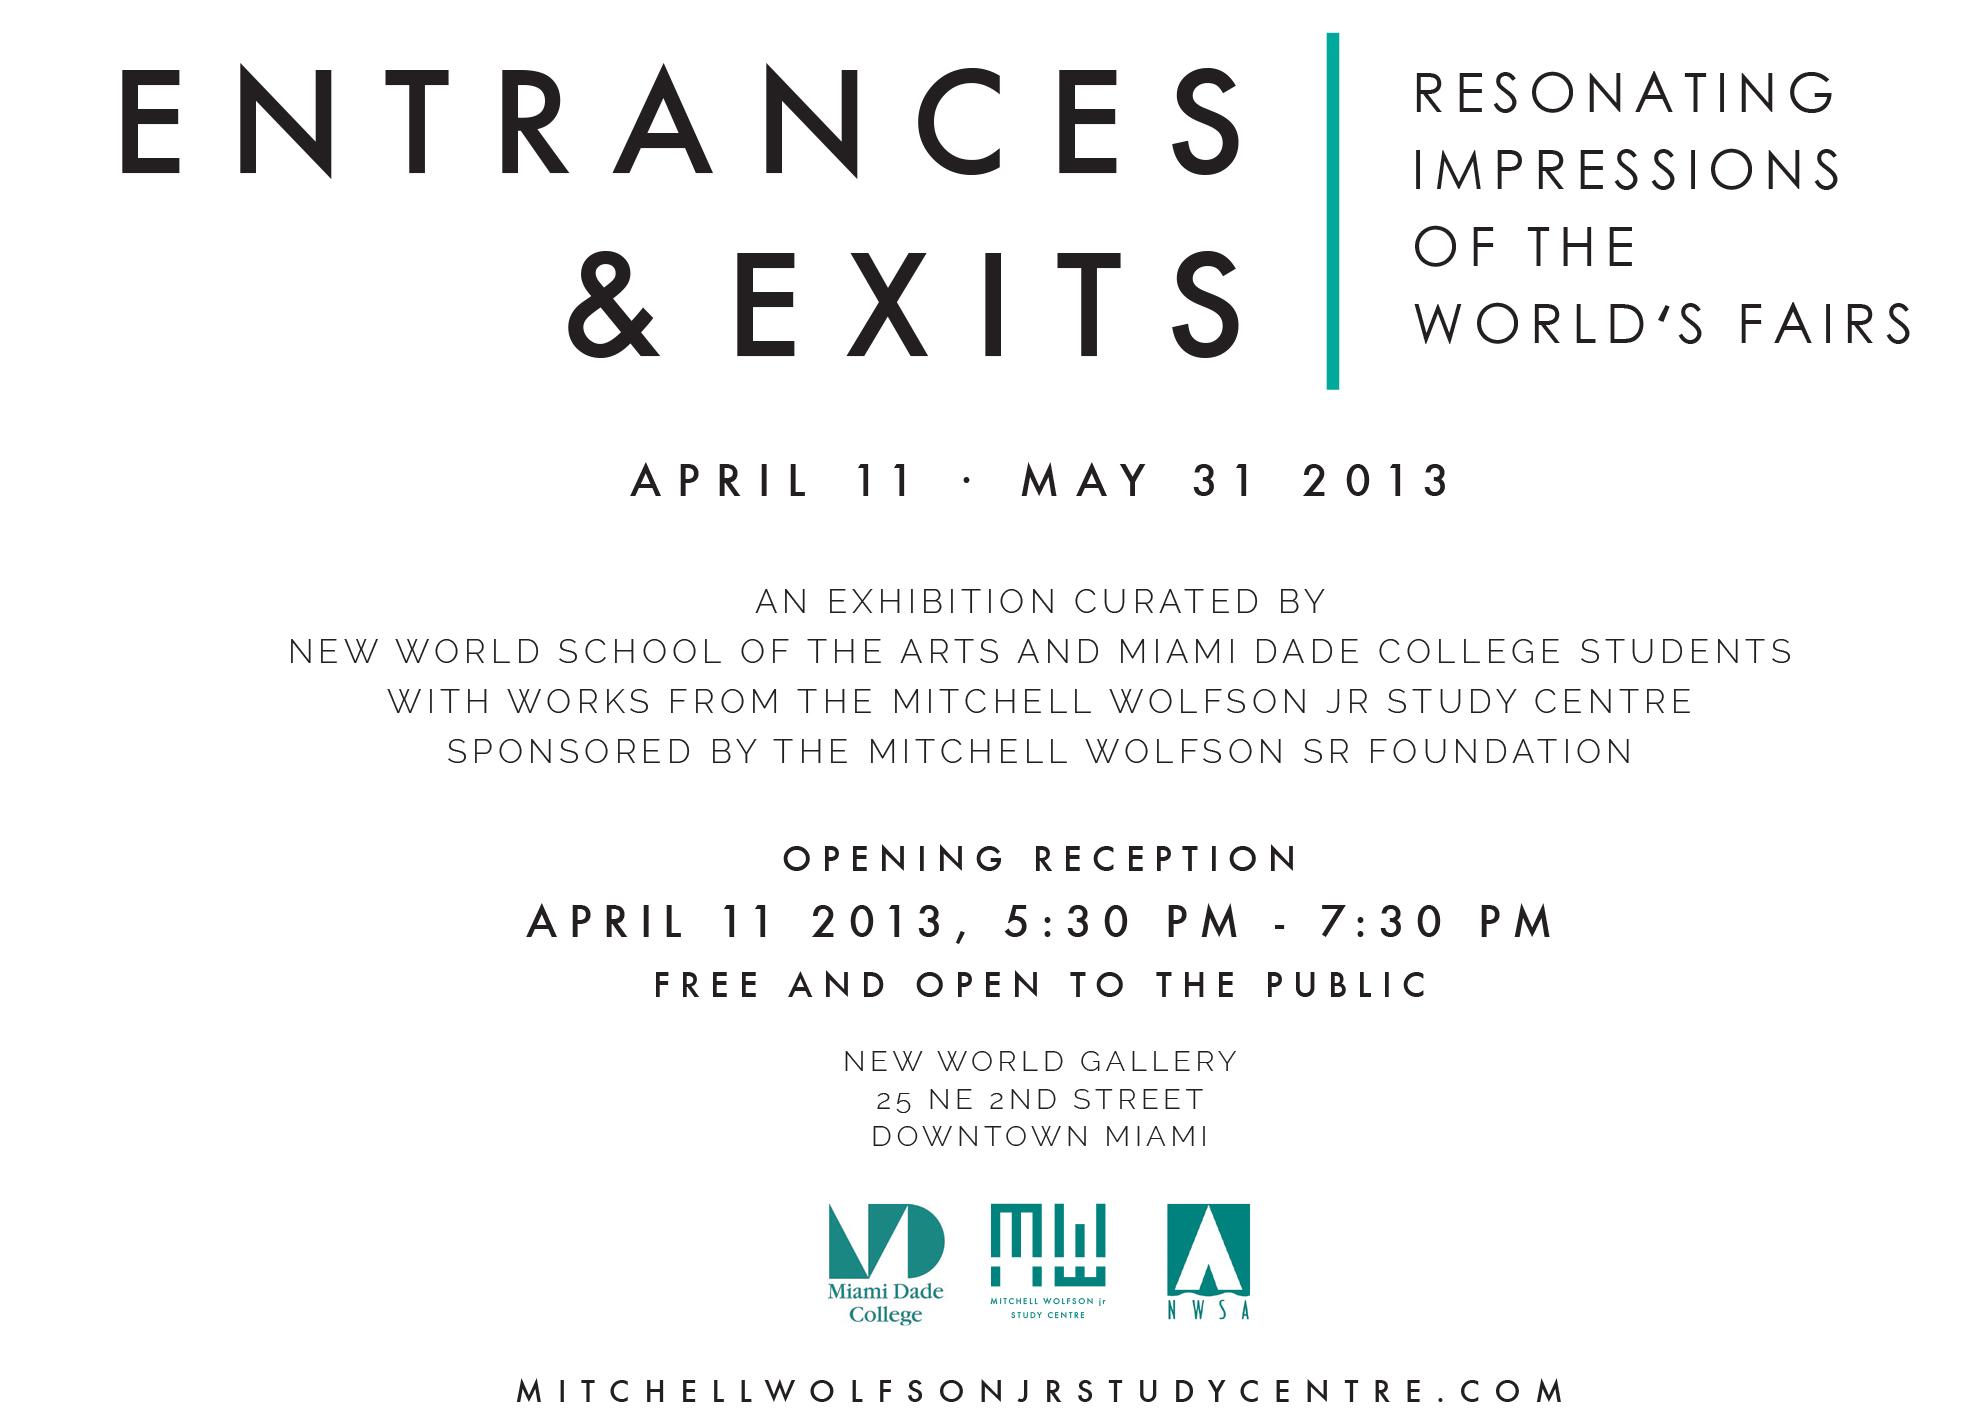 entrances&exits_invitation-2.jpg